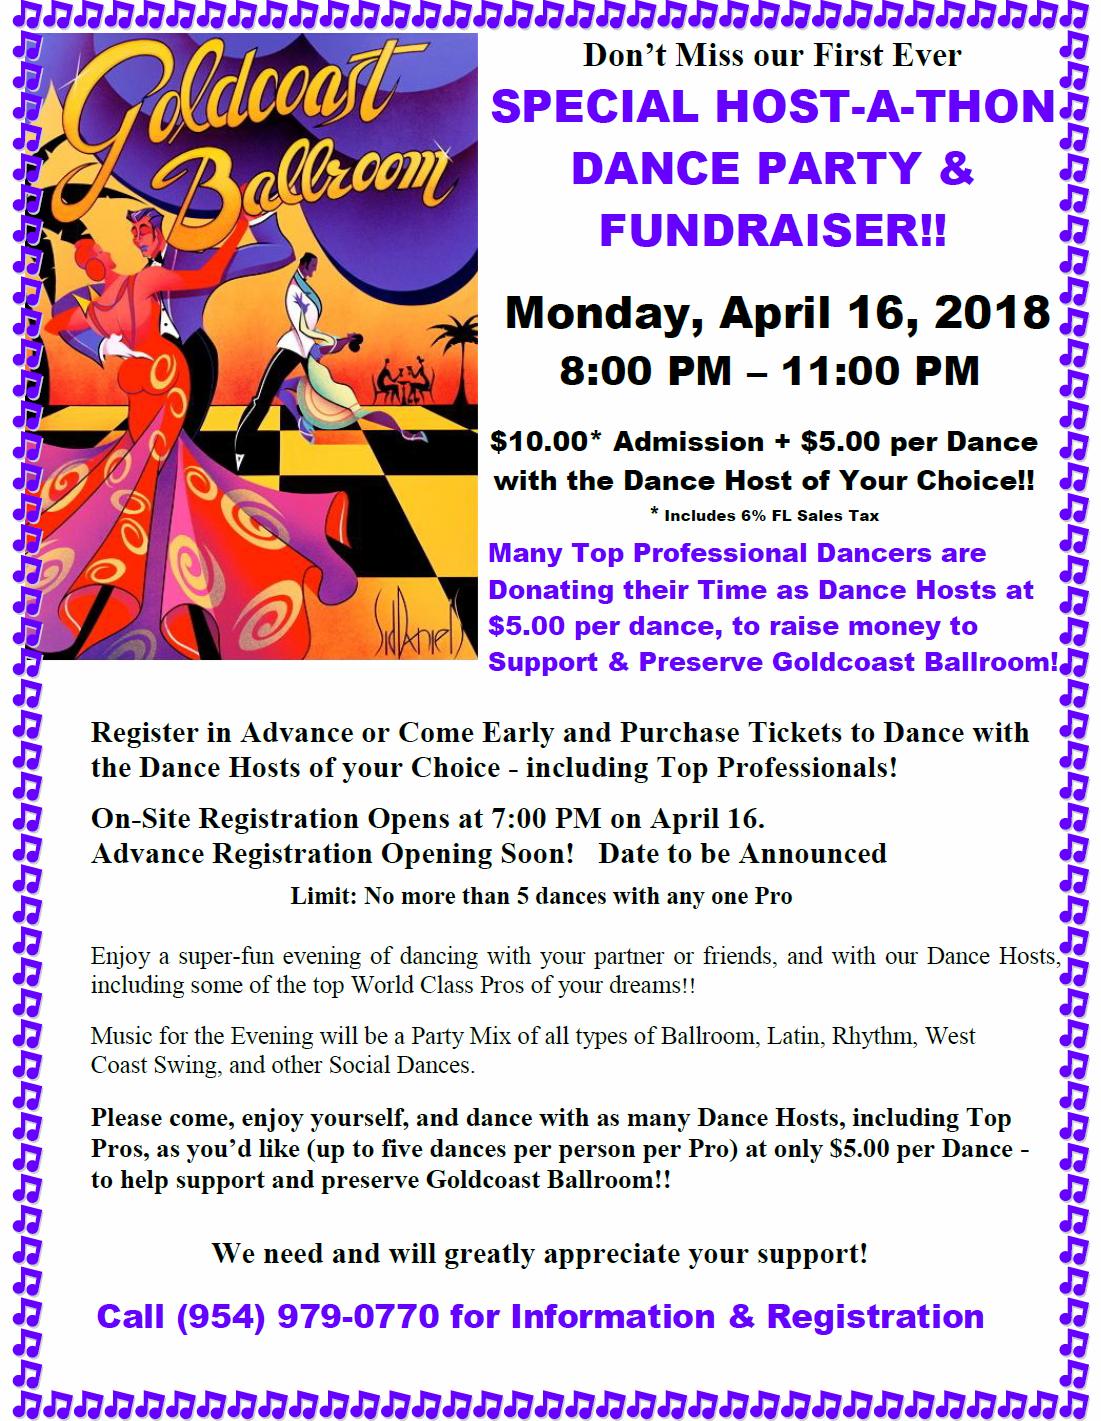 Special Host-a-thon Dance Party & Fund Raiser! - April 16, 2018